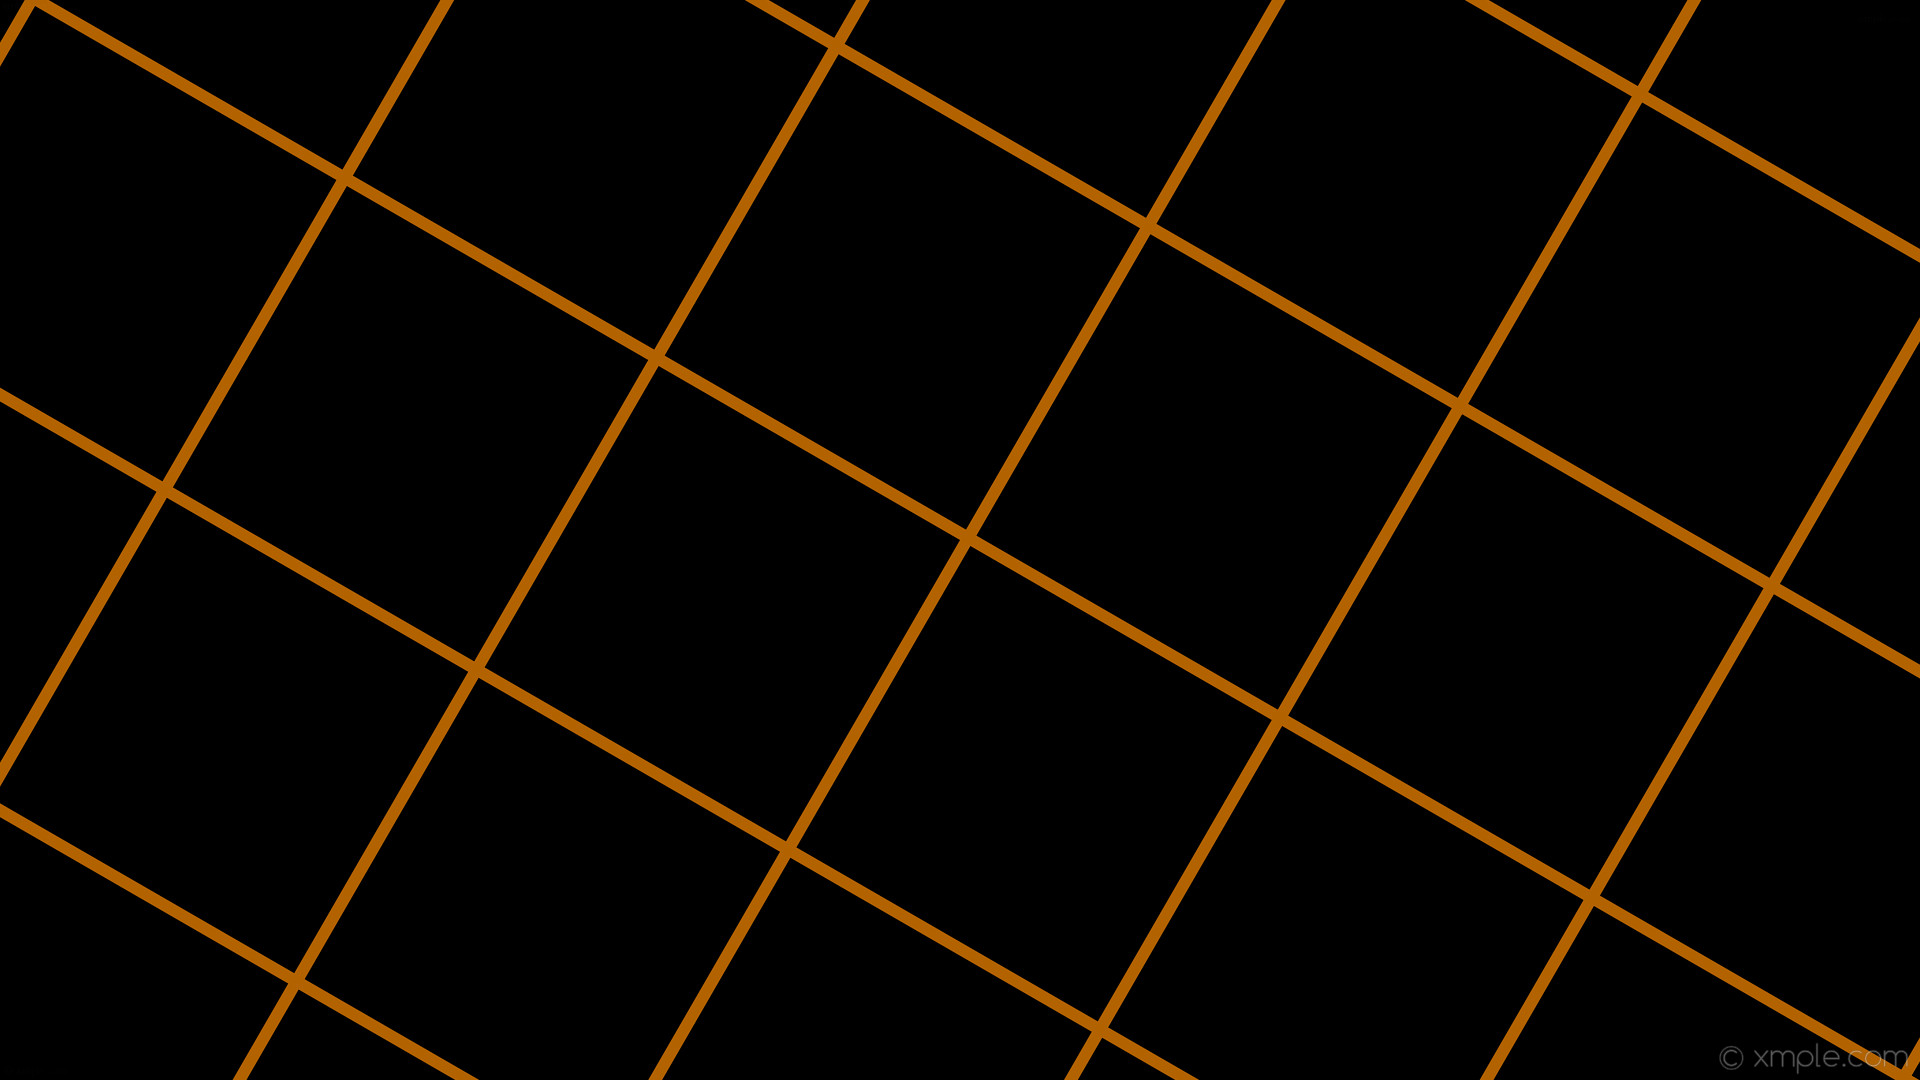 wallpaper graph paper orange black grid dark orange #000000 #ff8c00 60°  12px 360px